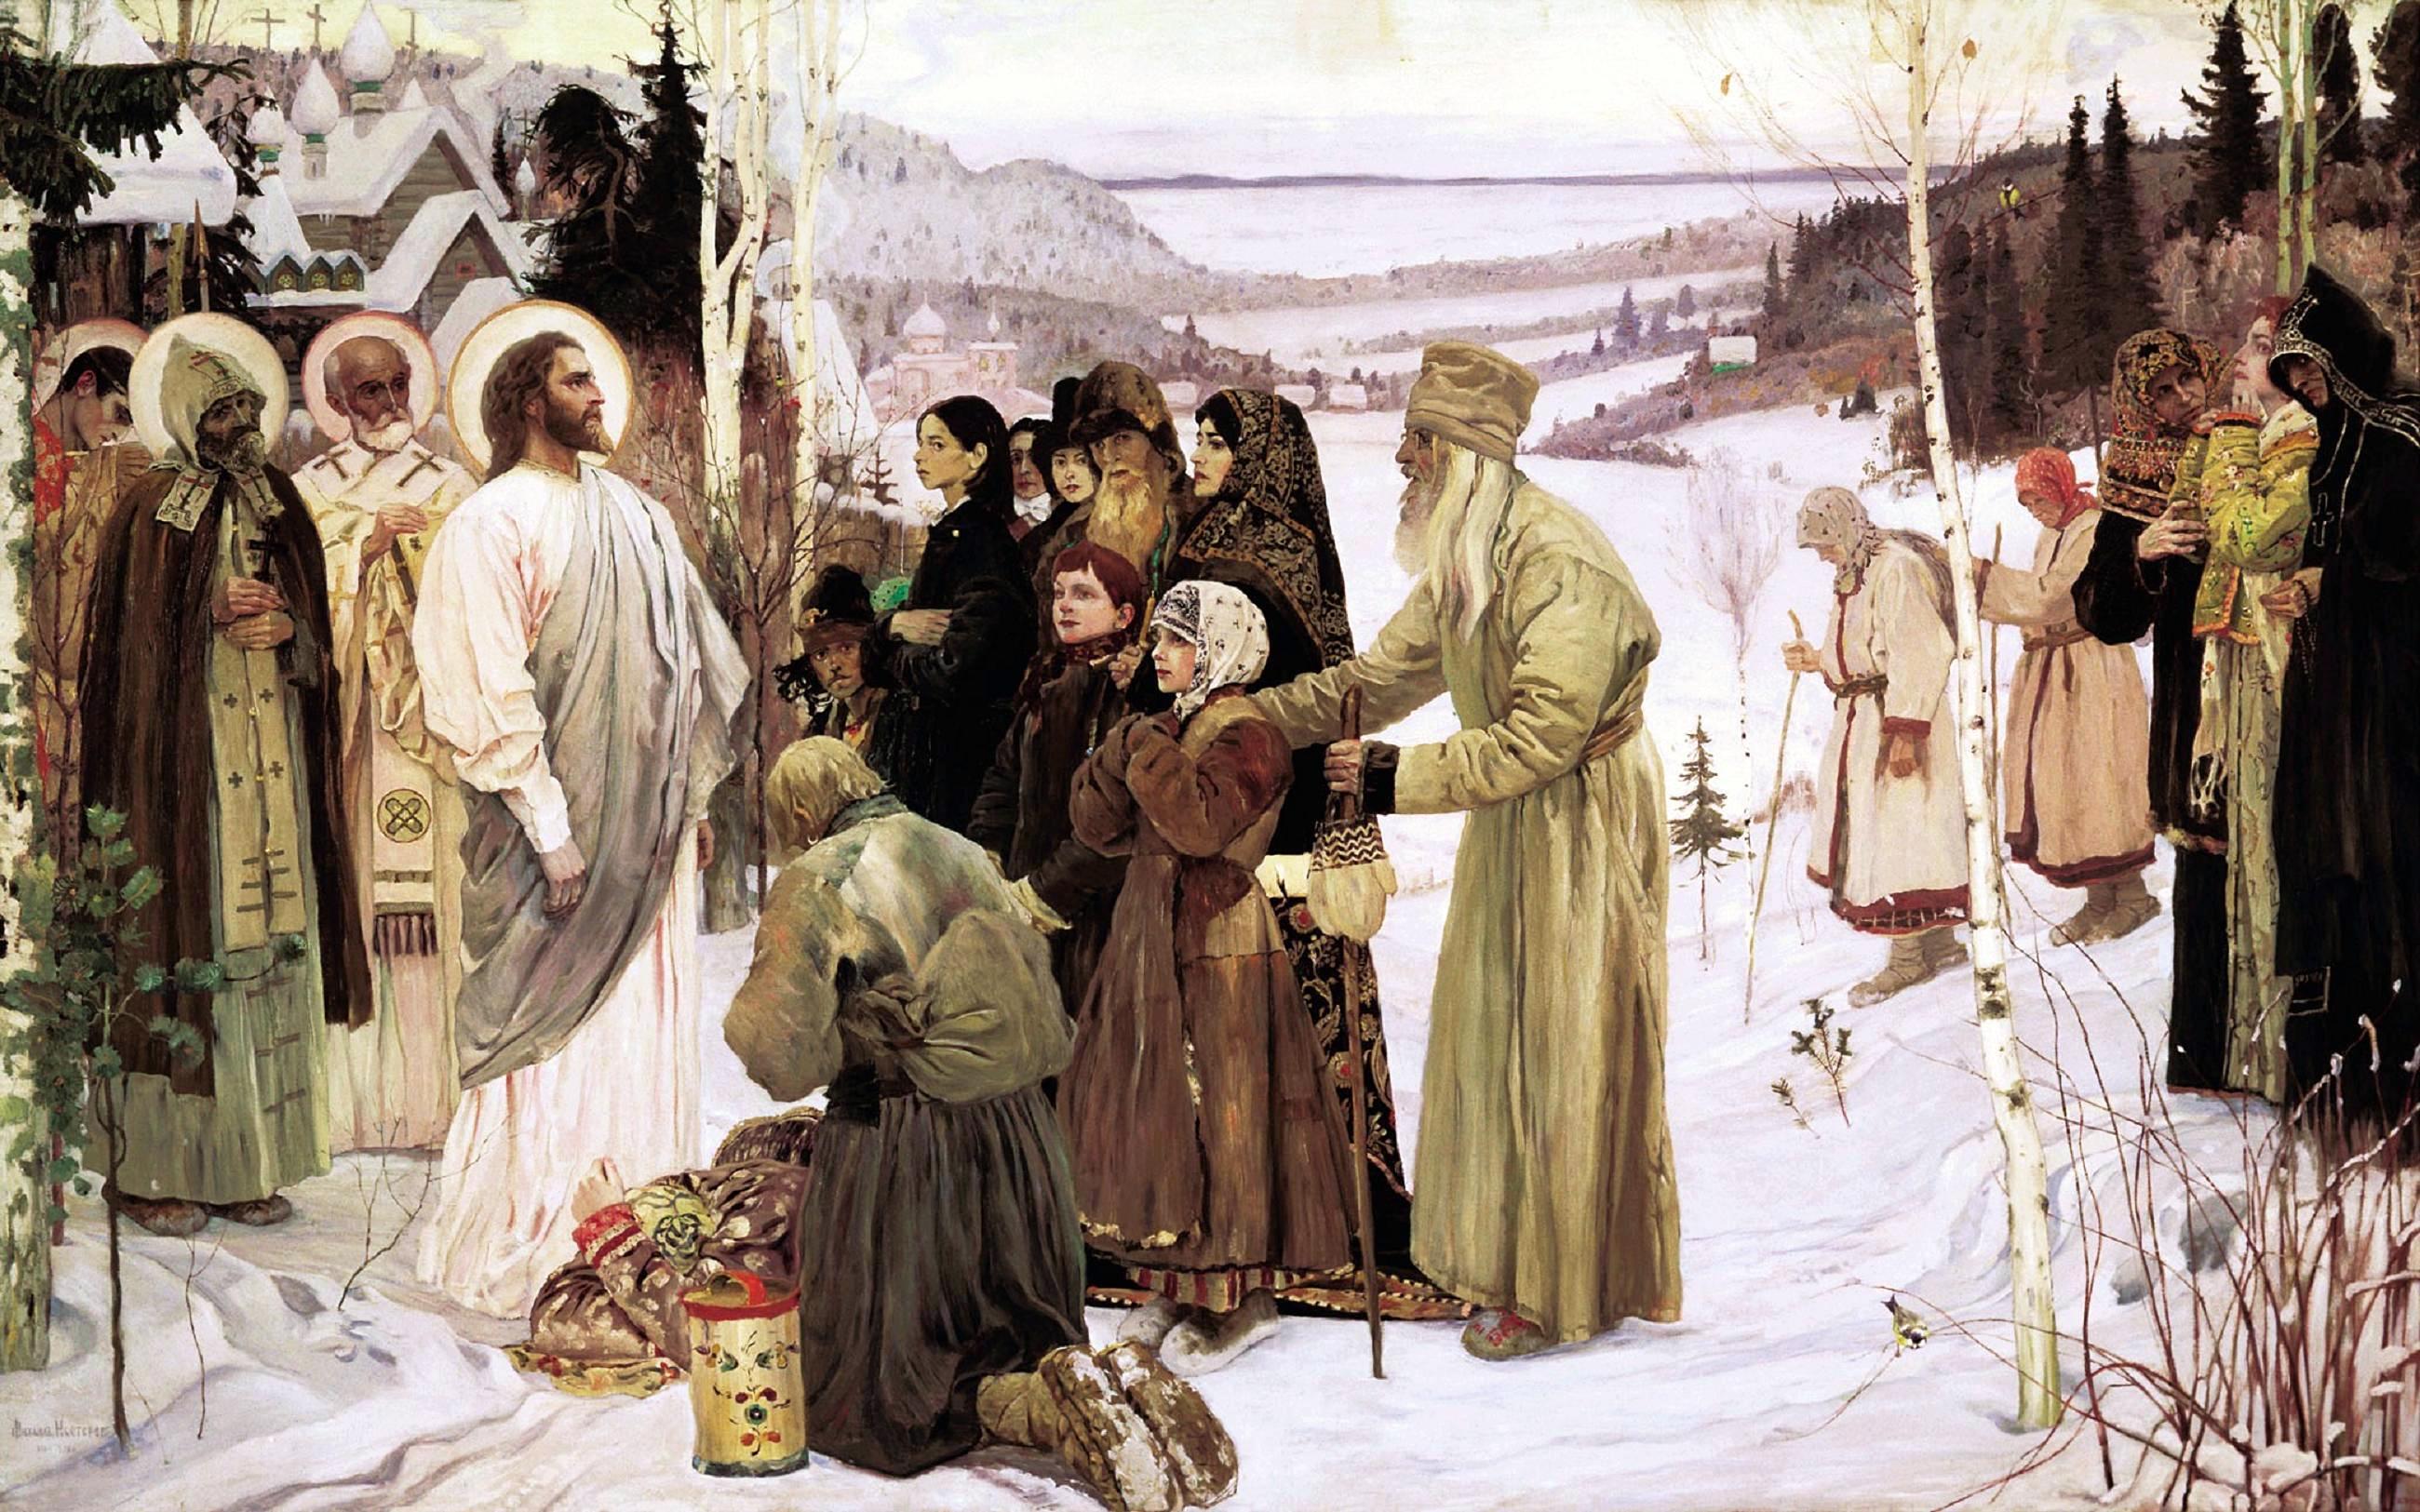 mikhail-nesterov-holy-rus-1905